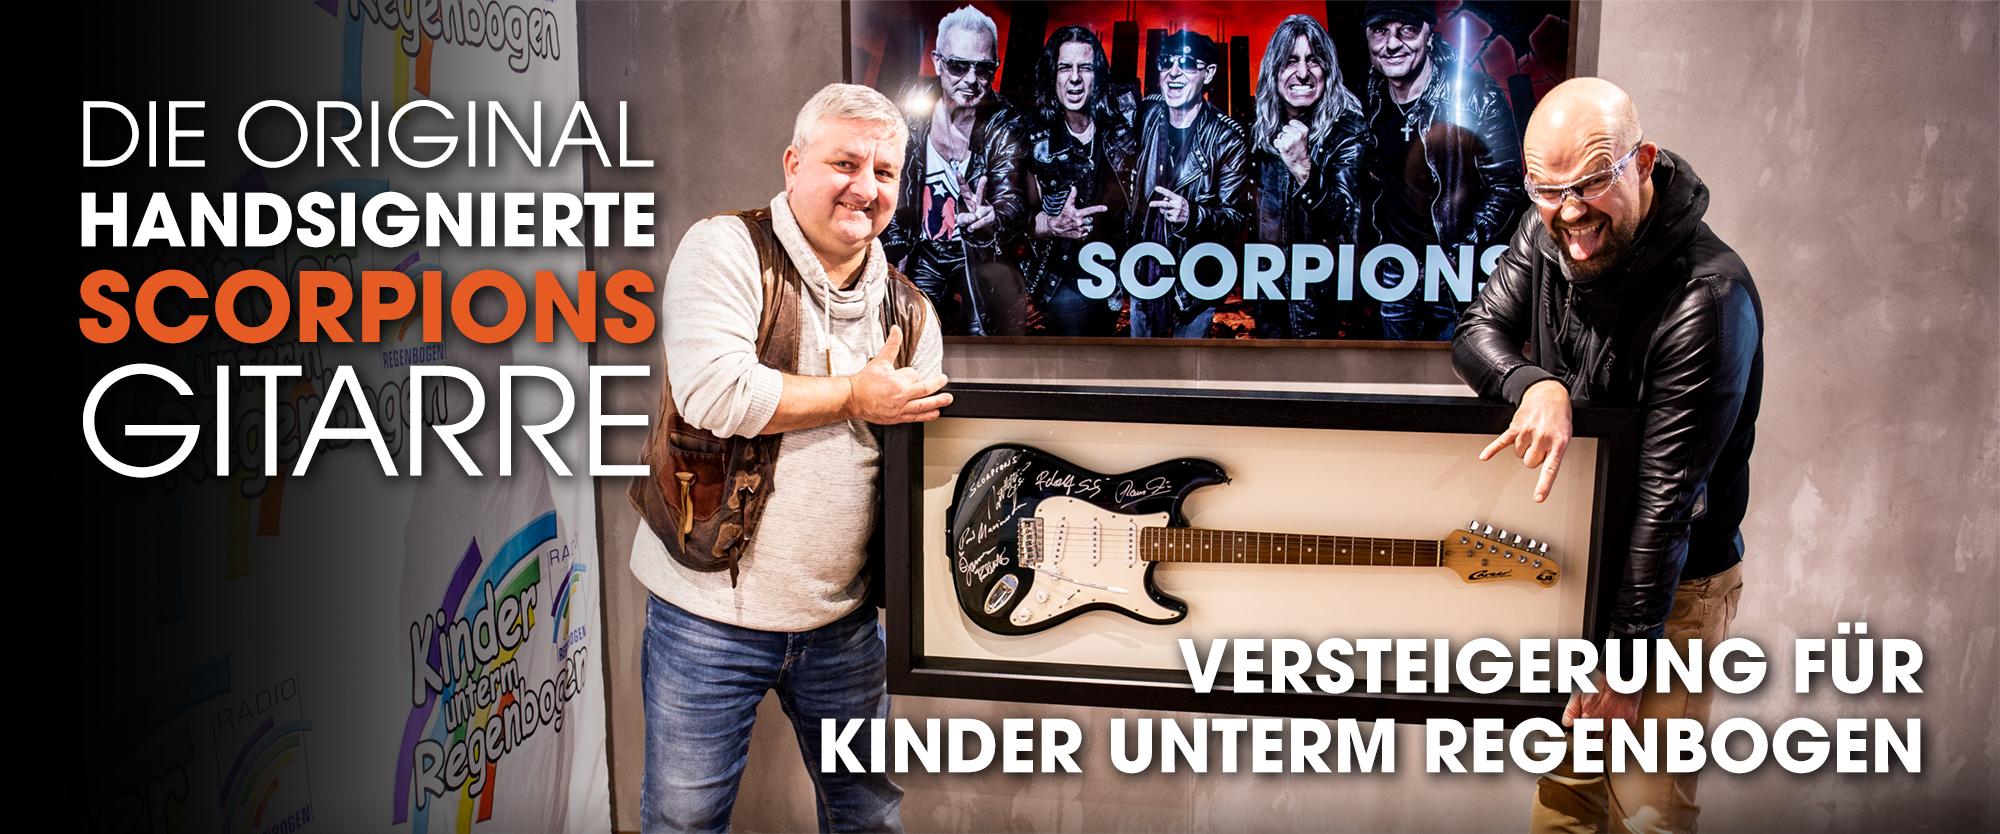 Scorpions-Gitarre-Titel.jpg